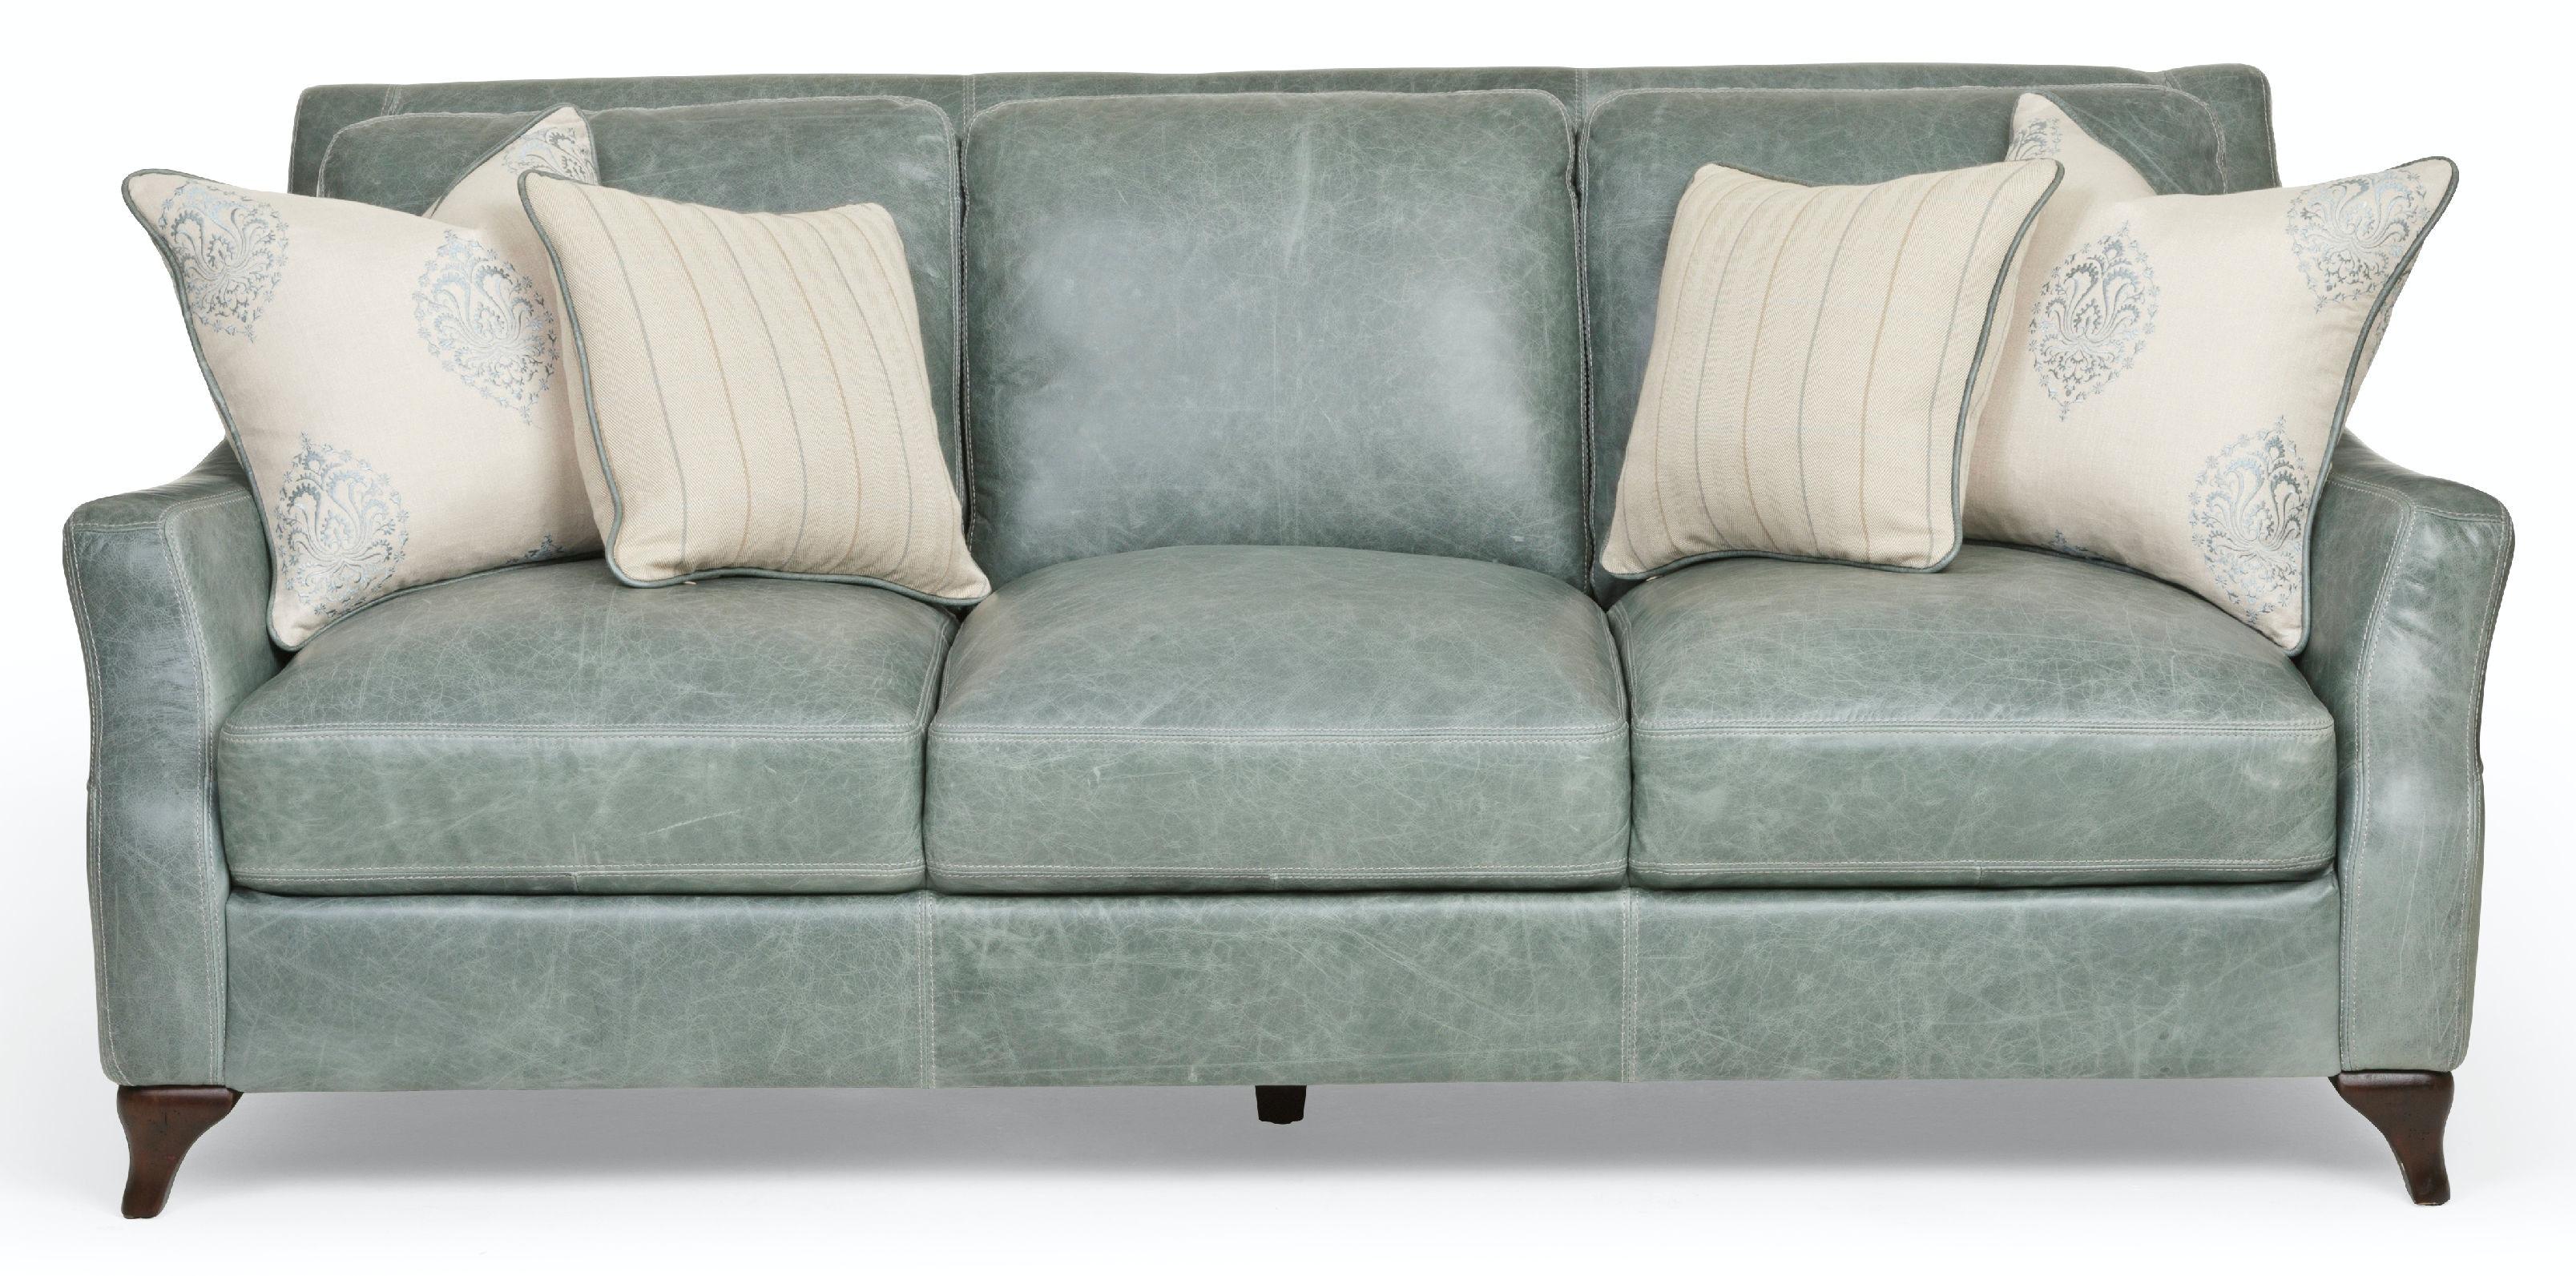 silver lake leather sofa - Simon Li Furniture